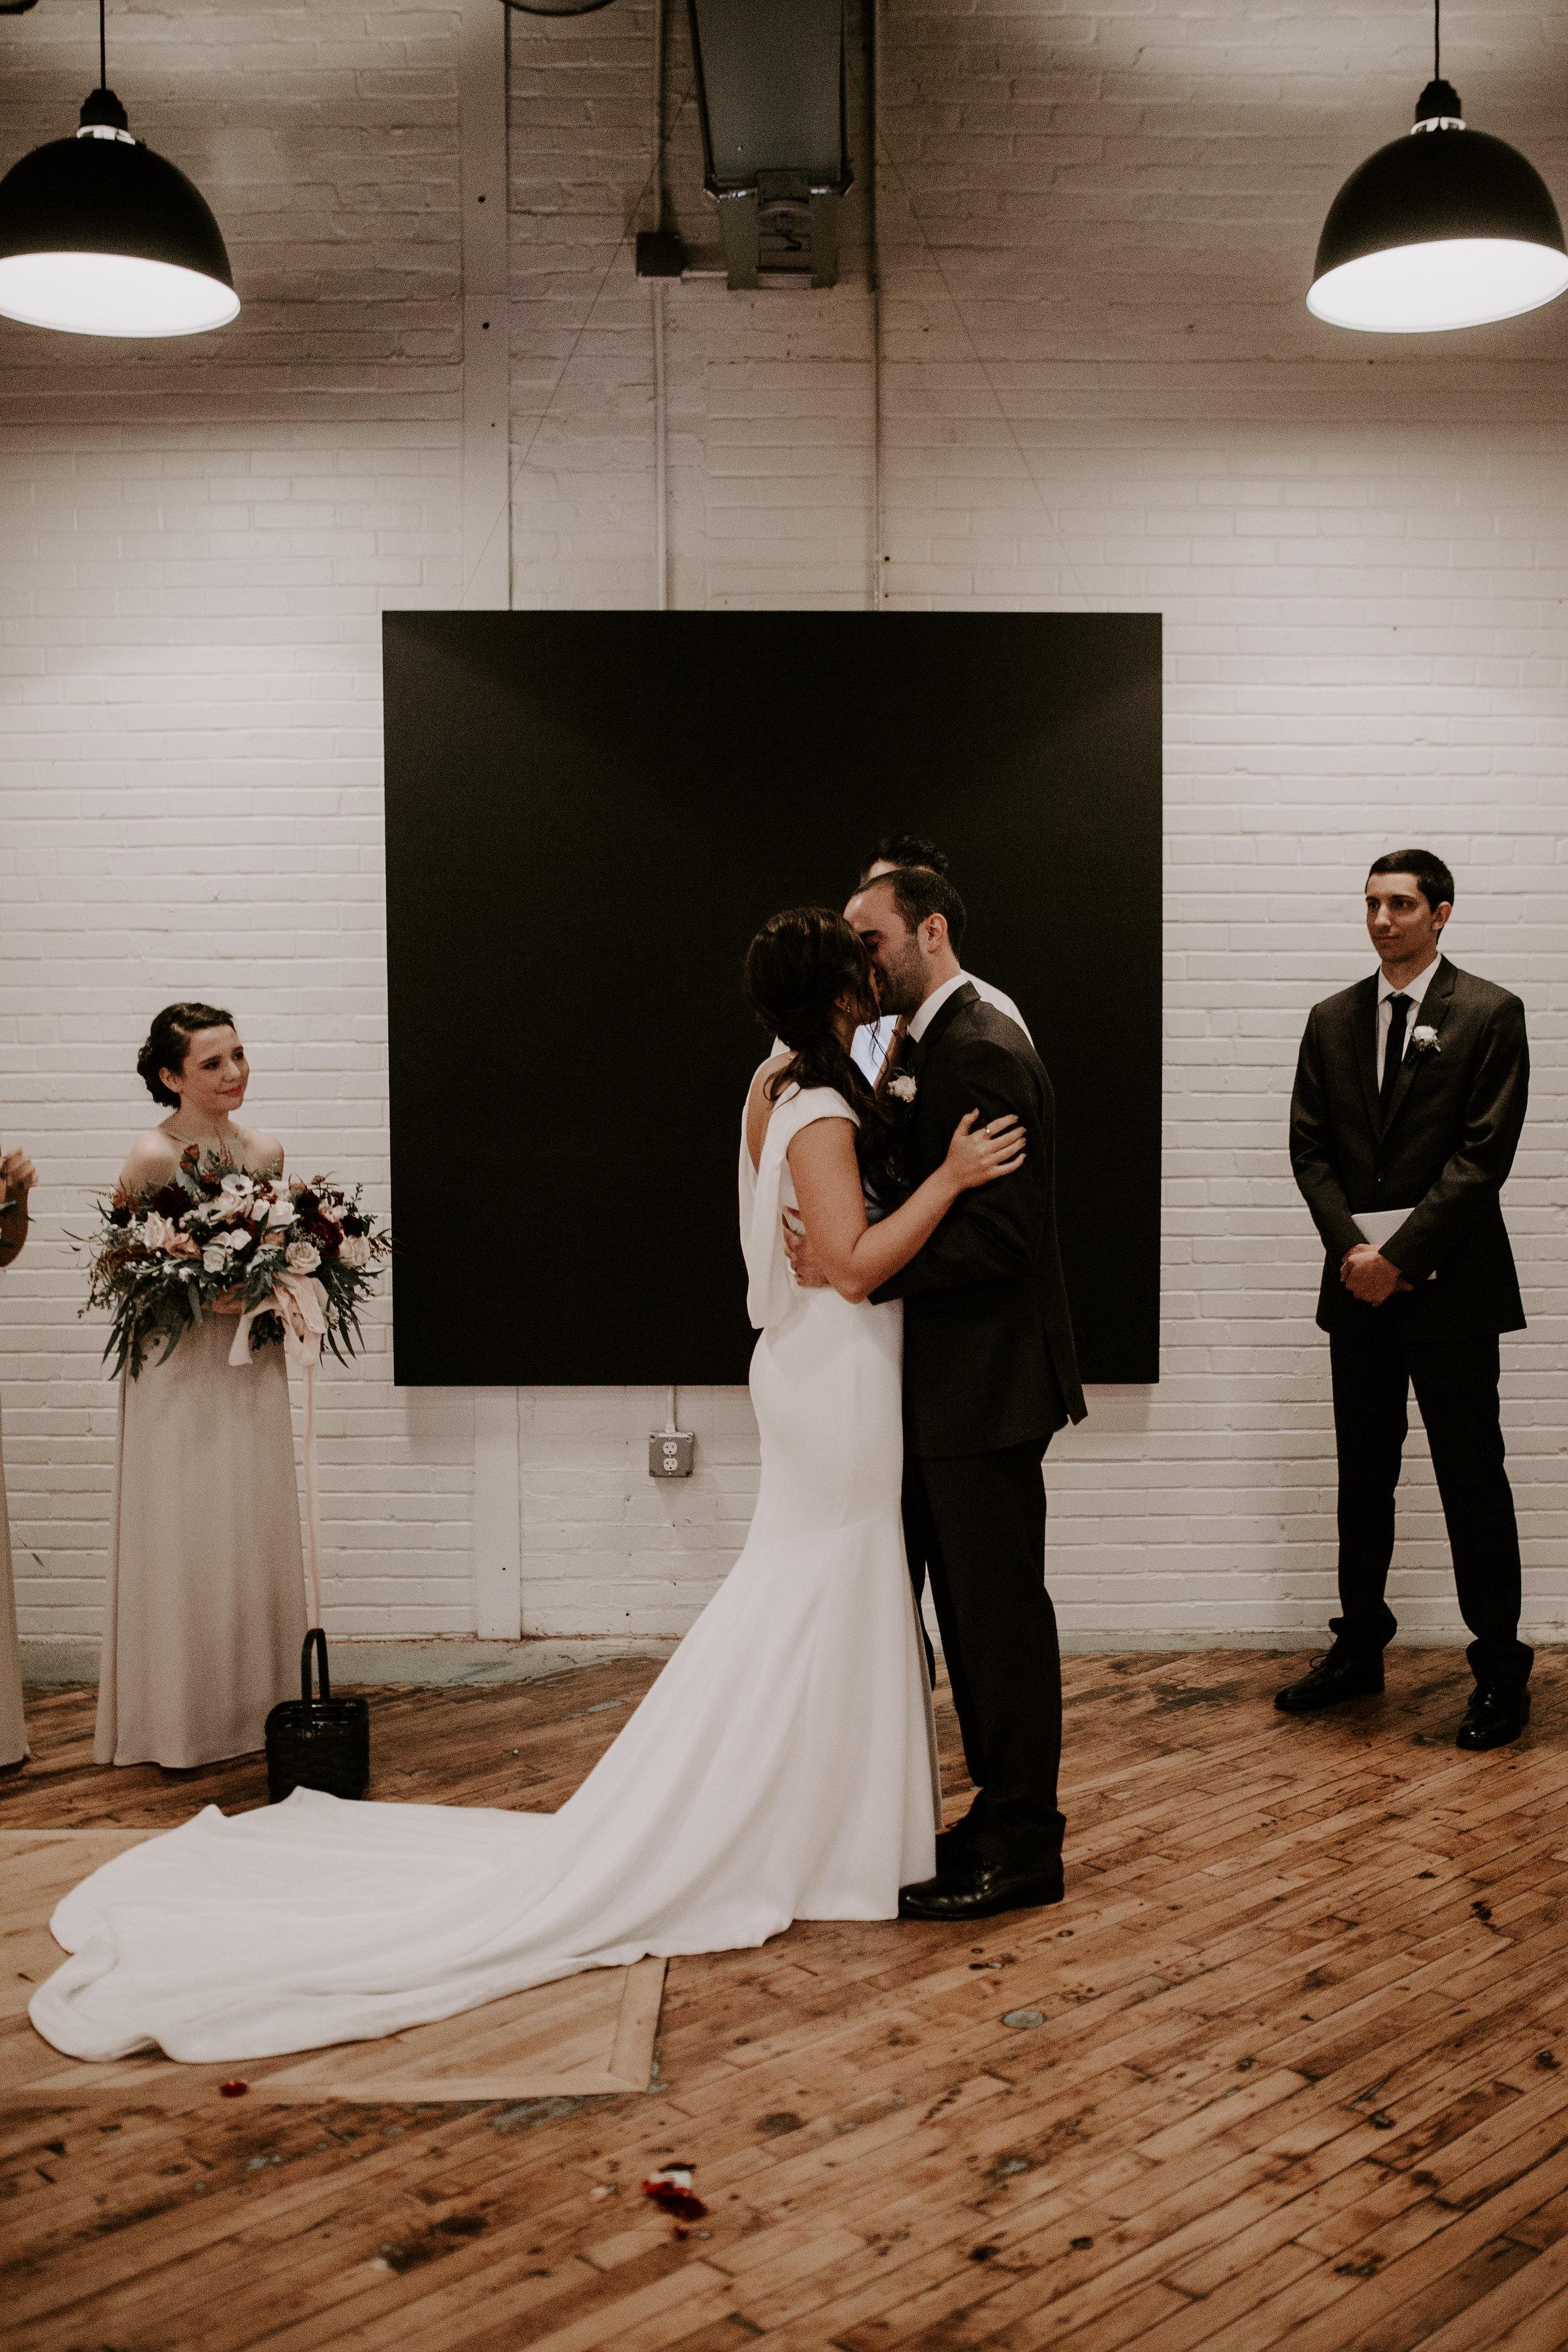 Minimalist Industrial Wedding A Griffin Events Mikayla Herrick DC578.jpg